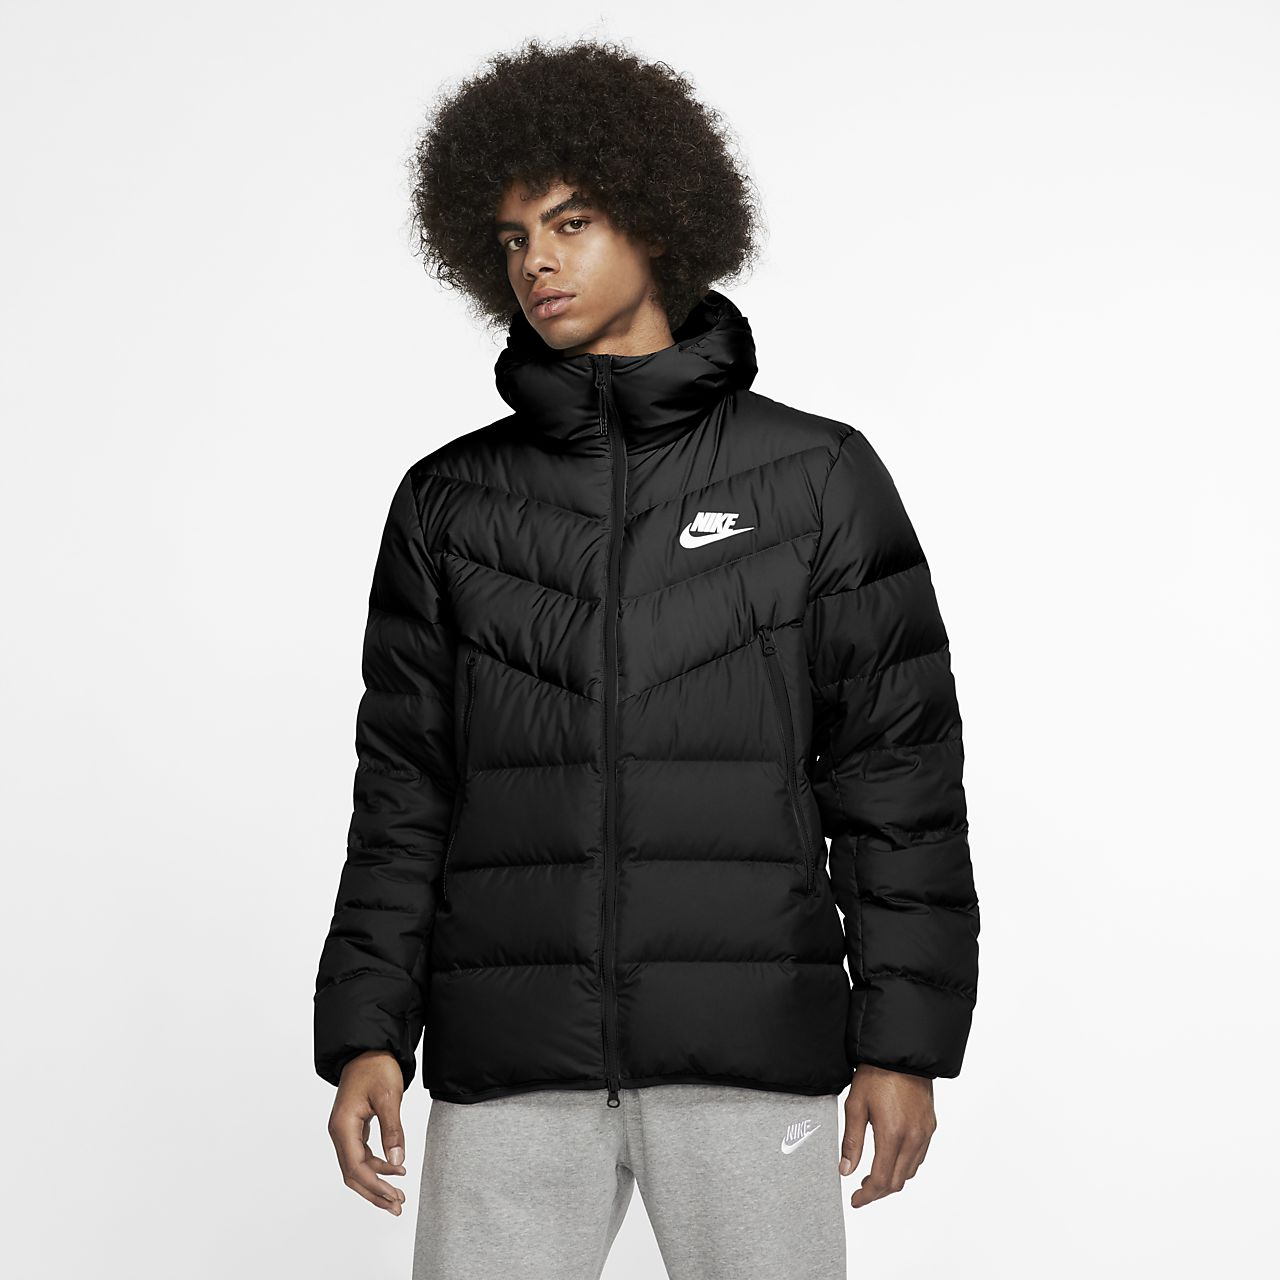 6892e8b99c7c Veste à capuche Nike Sportswear Windrunner Down Fill pour Homme ...